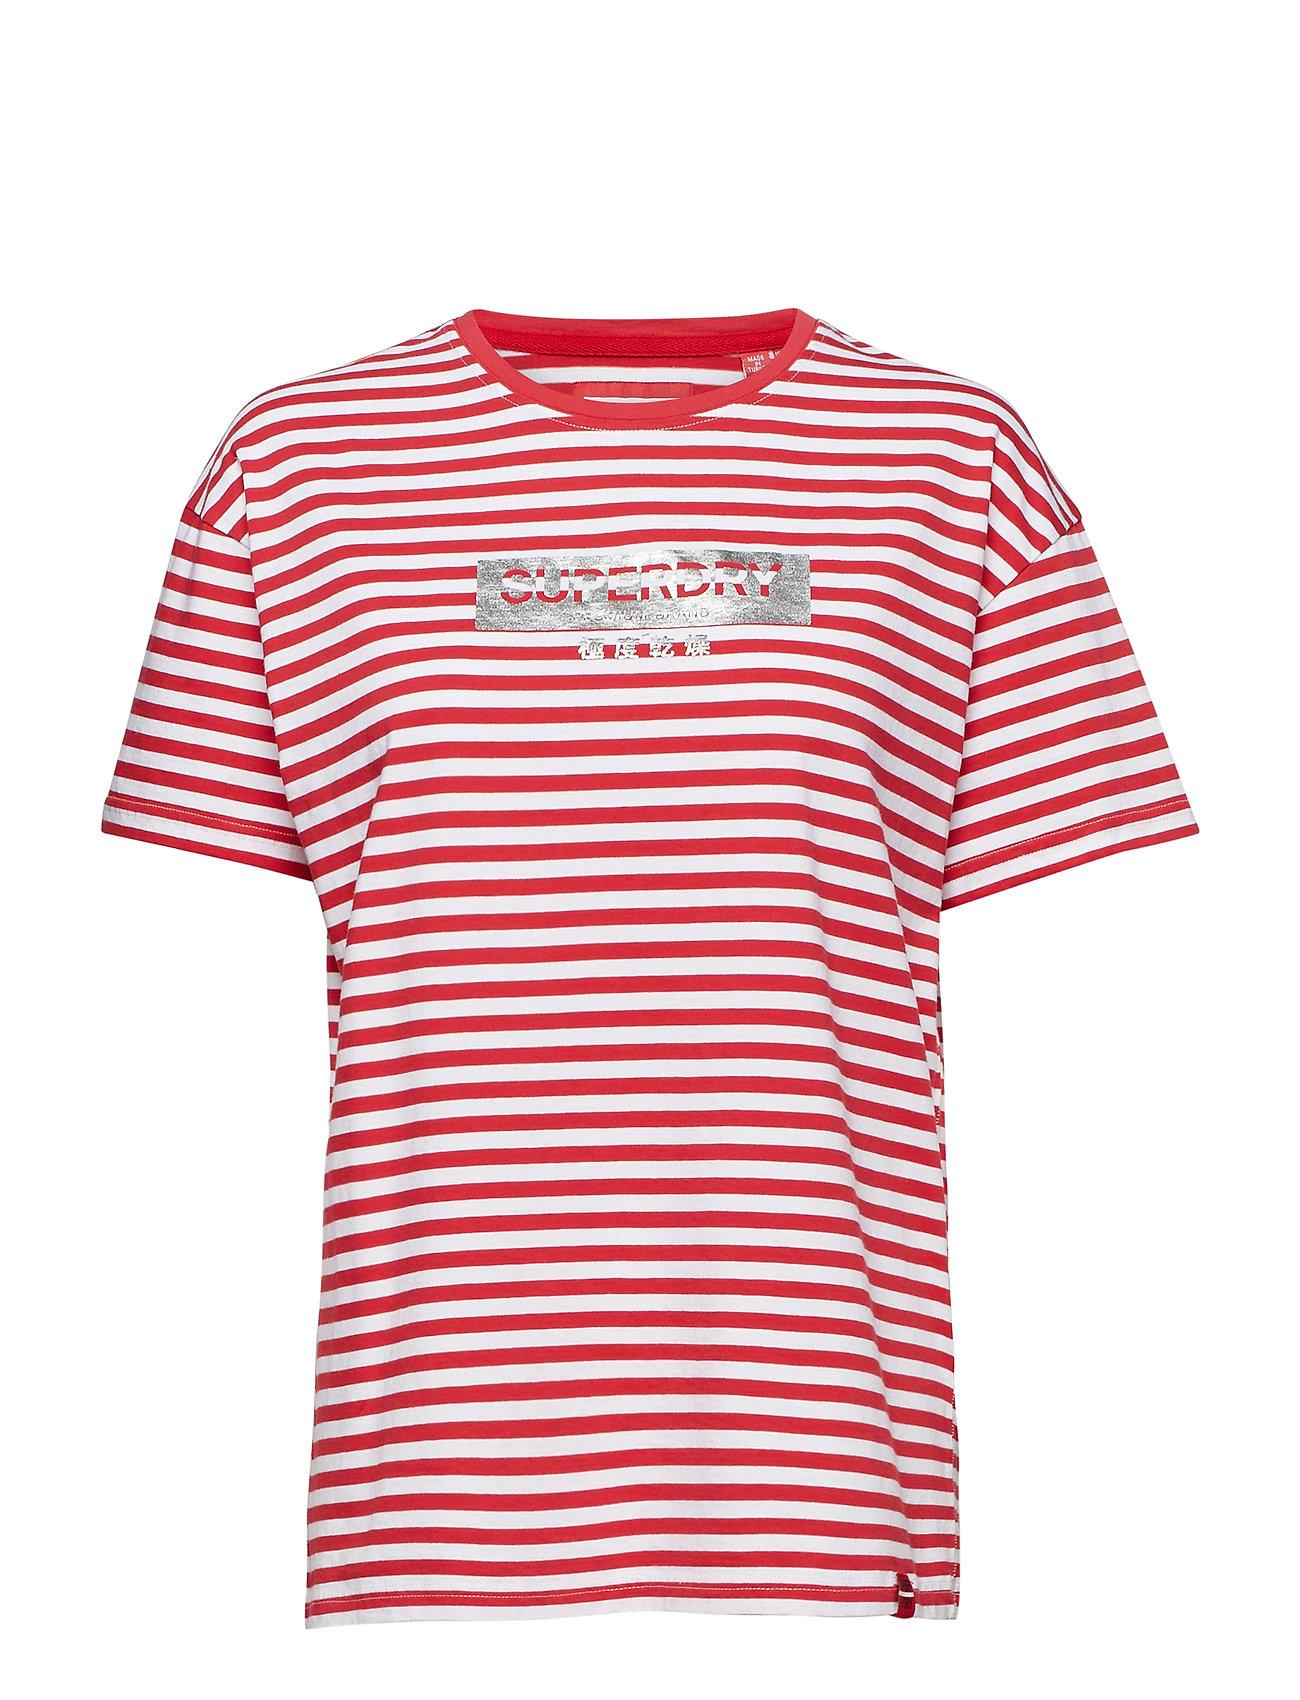 Minimal Red Stripe Portland Logo StripeSuperdry optic Teenautical KTclFJ1